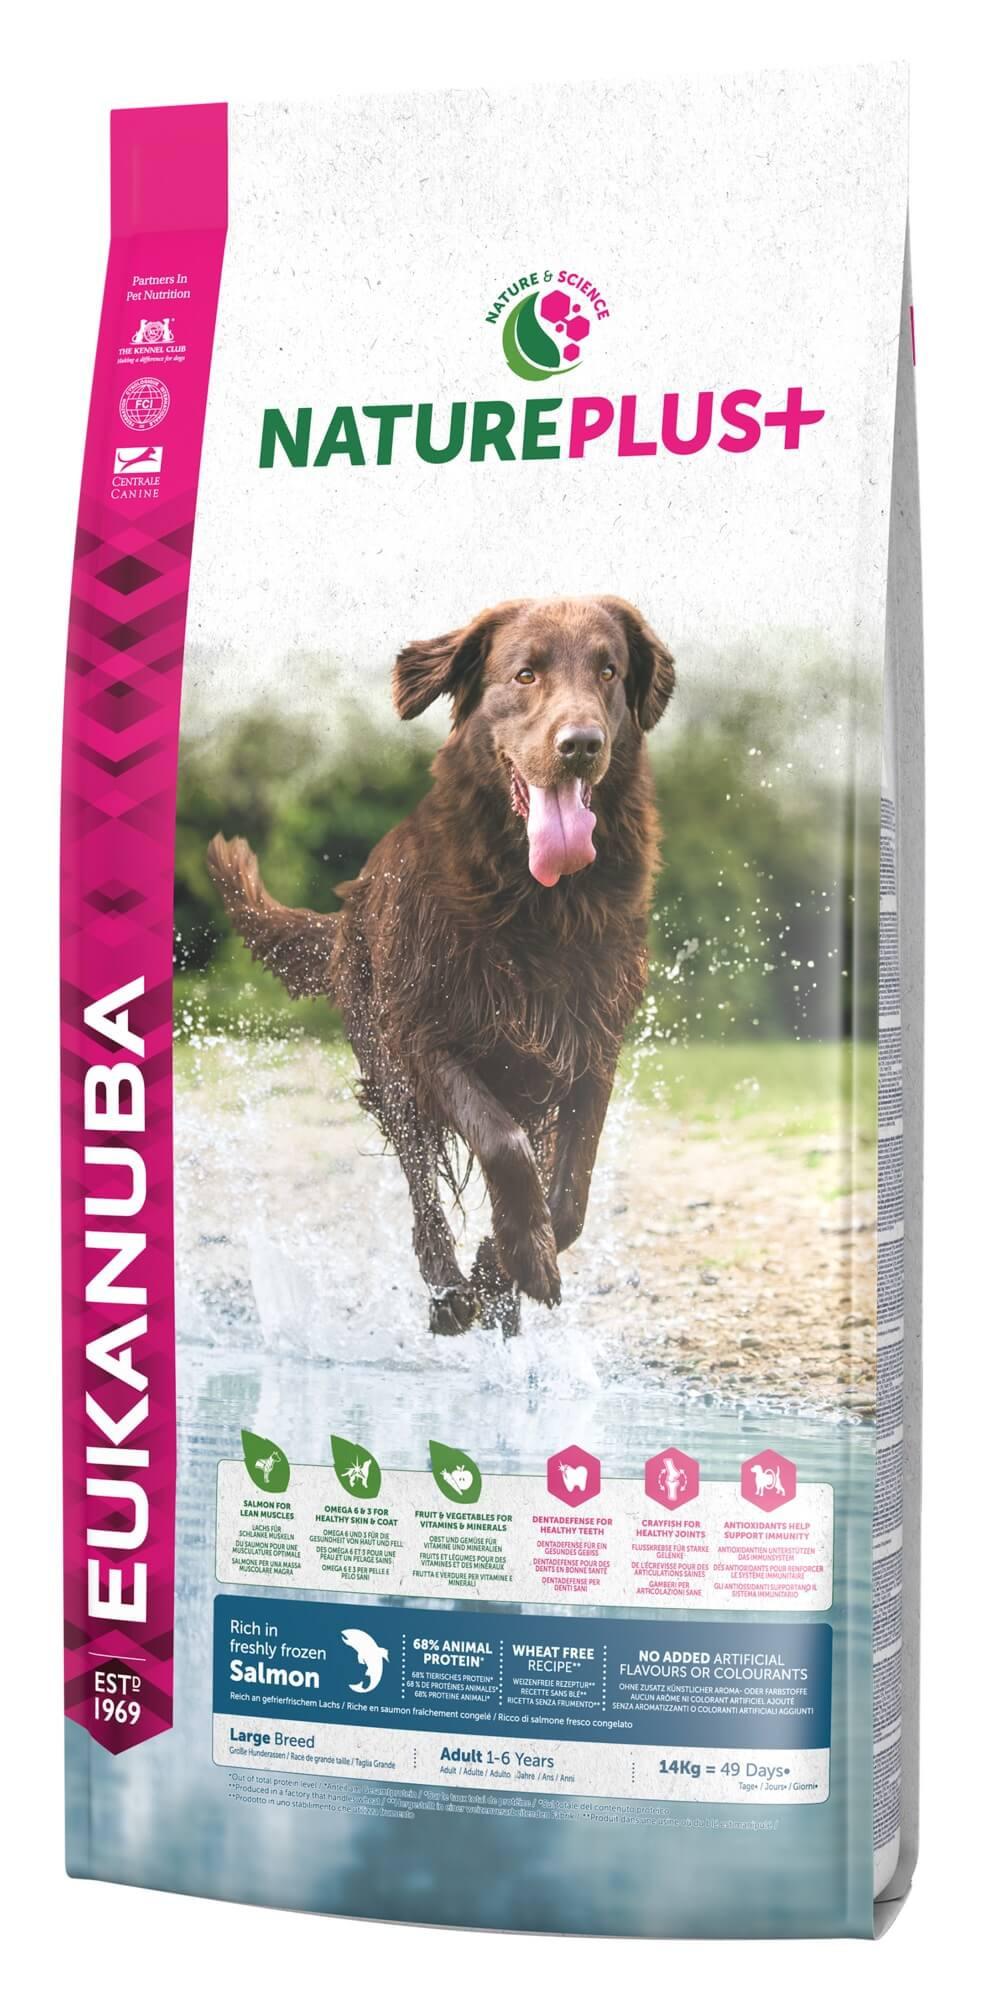 Eukanuba NaturePlus+ Adult Large Breed Lachs Hundefutter